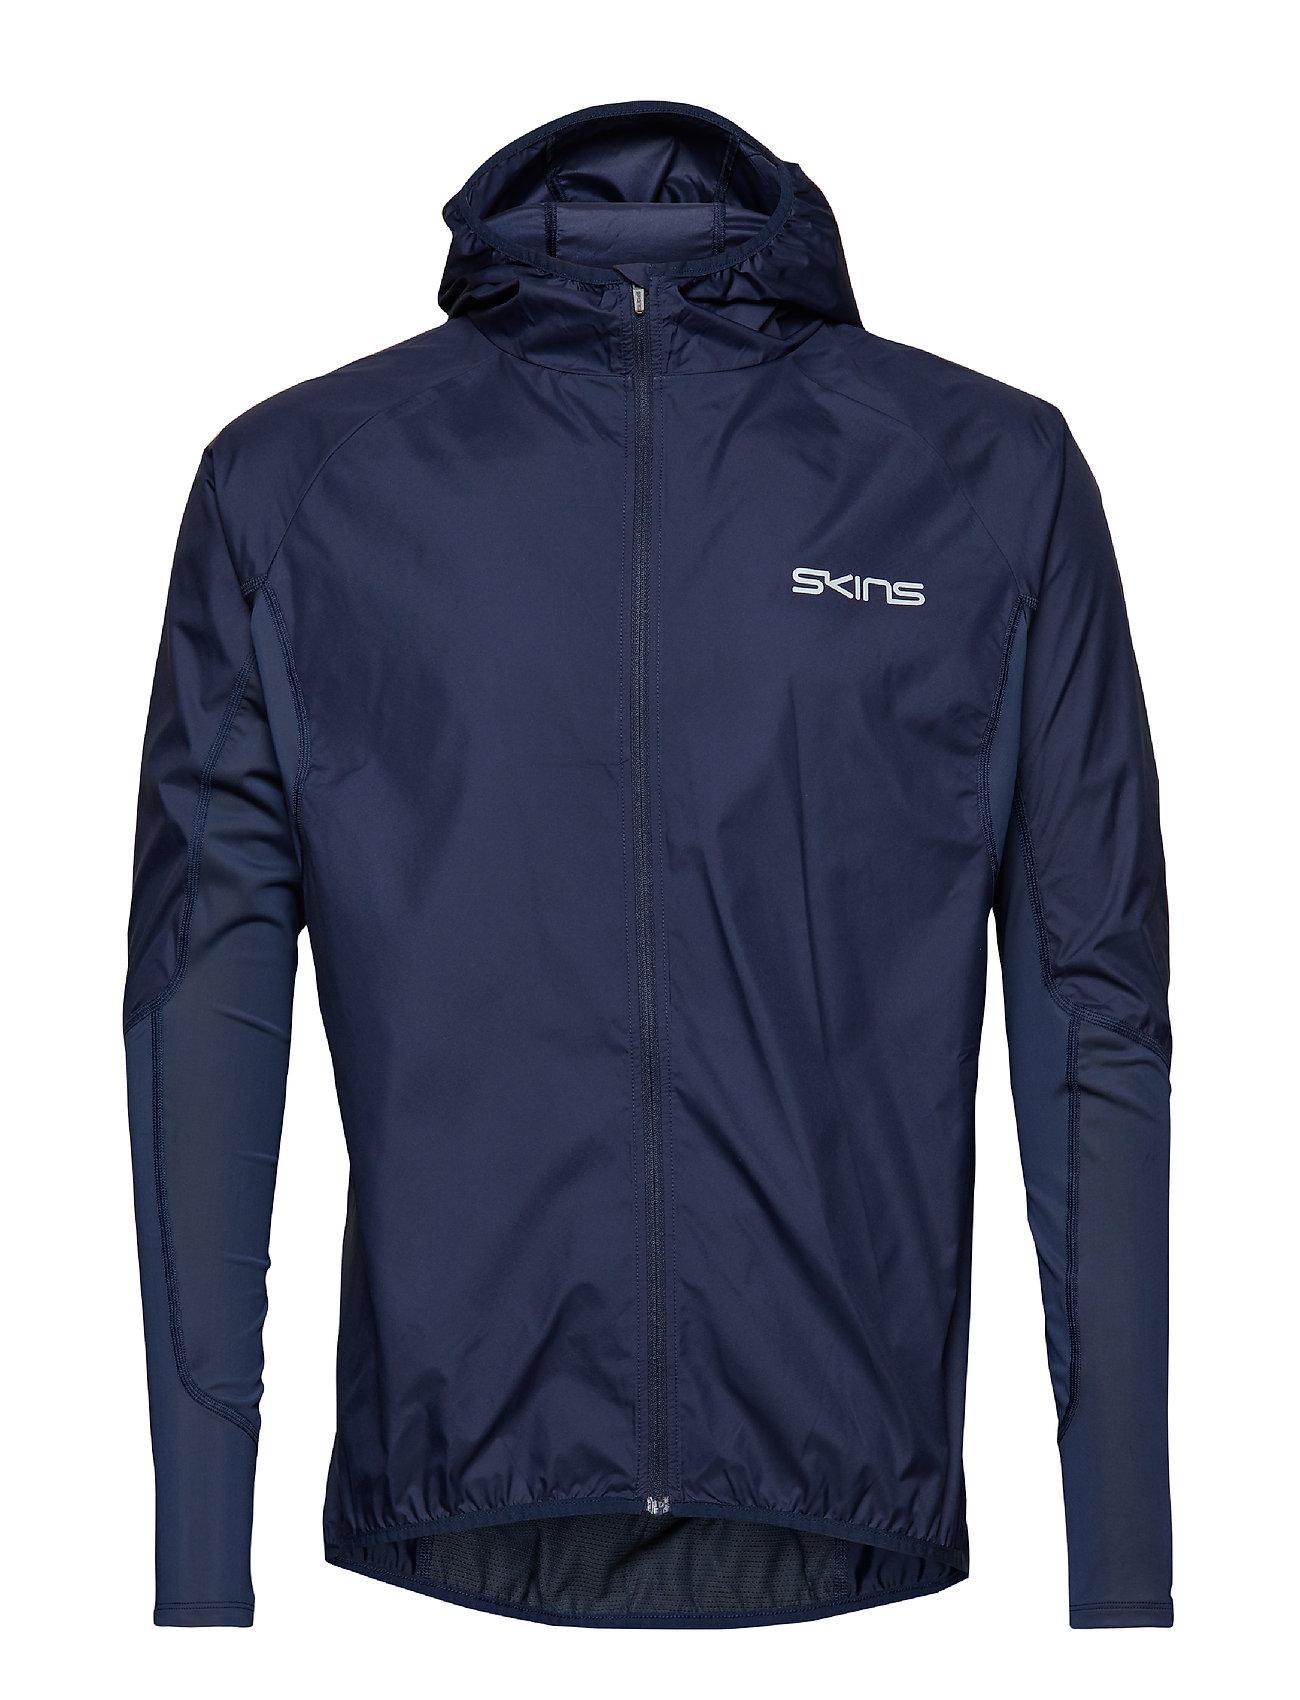 Jacketnavy Enigineered Wind Activewear Mens BlueSkins Rone FK1lcTJ